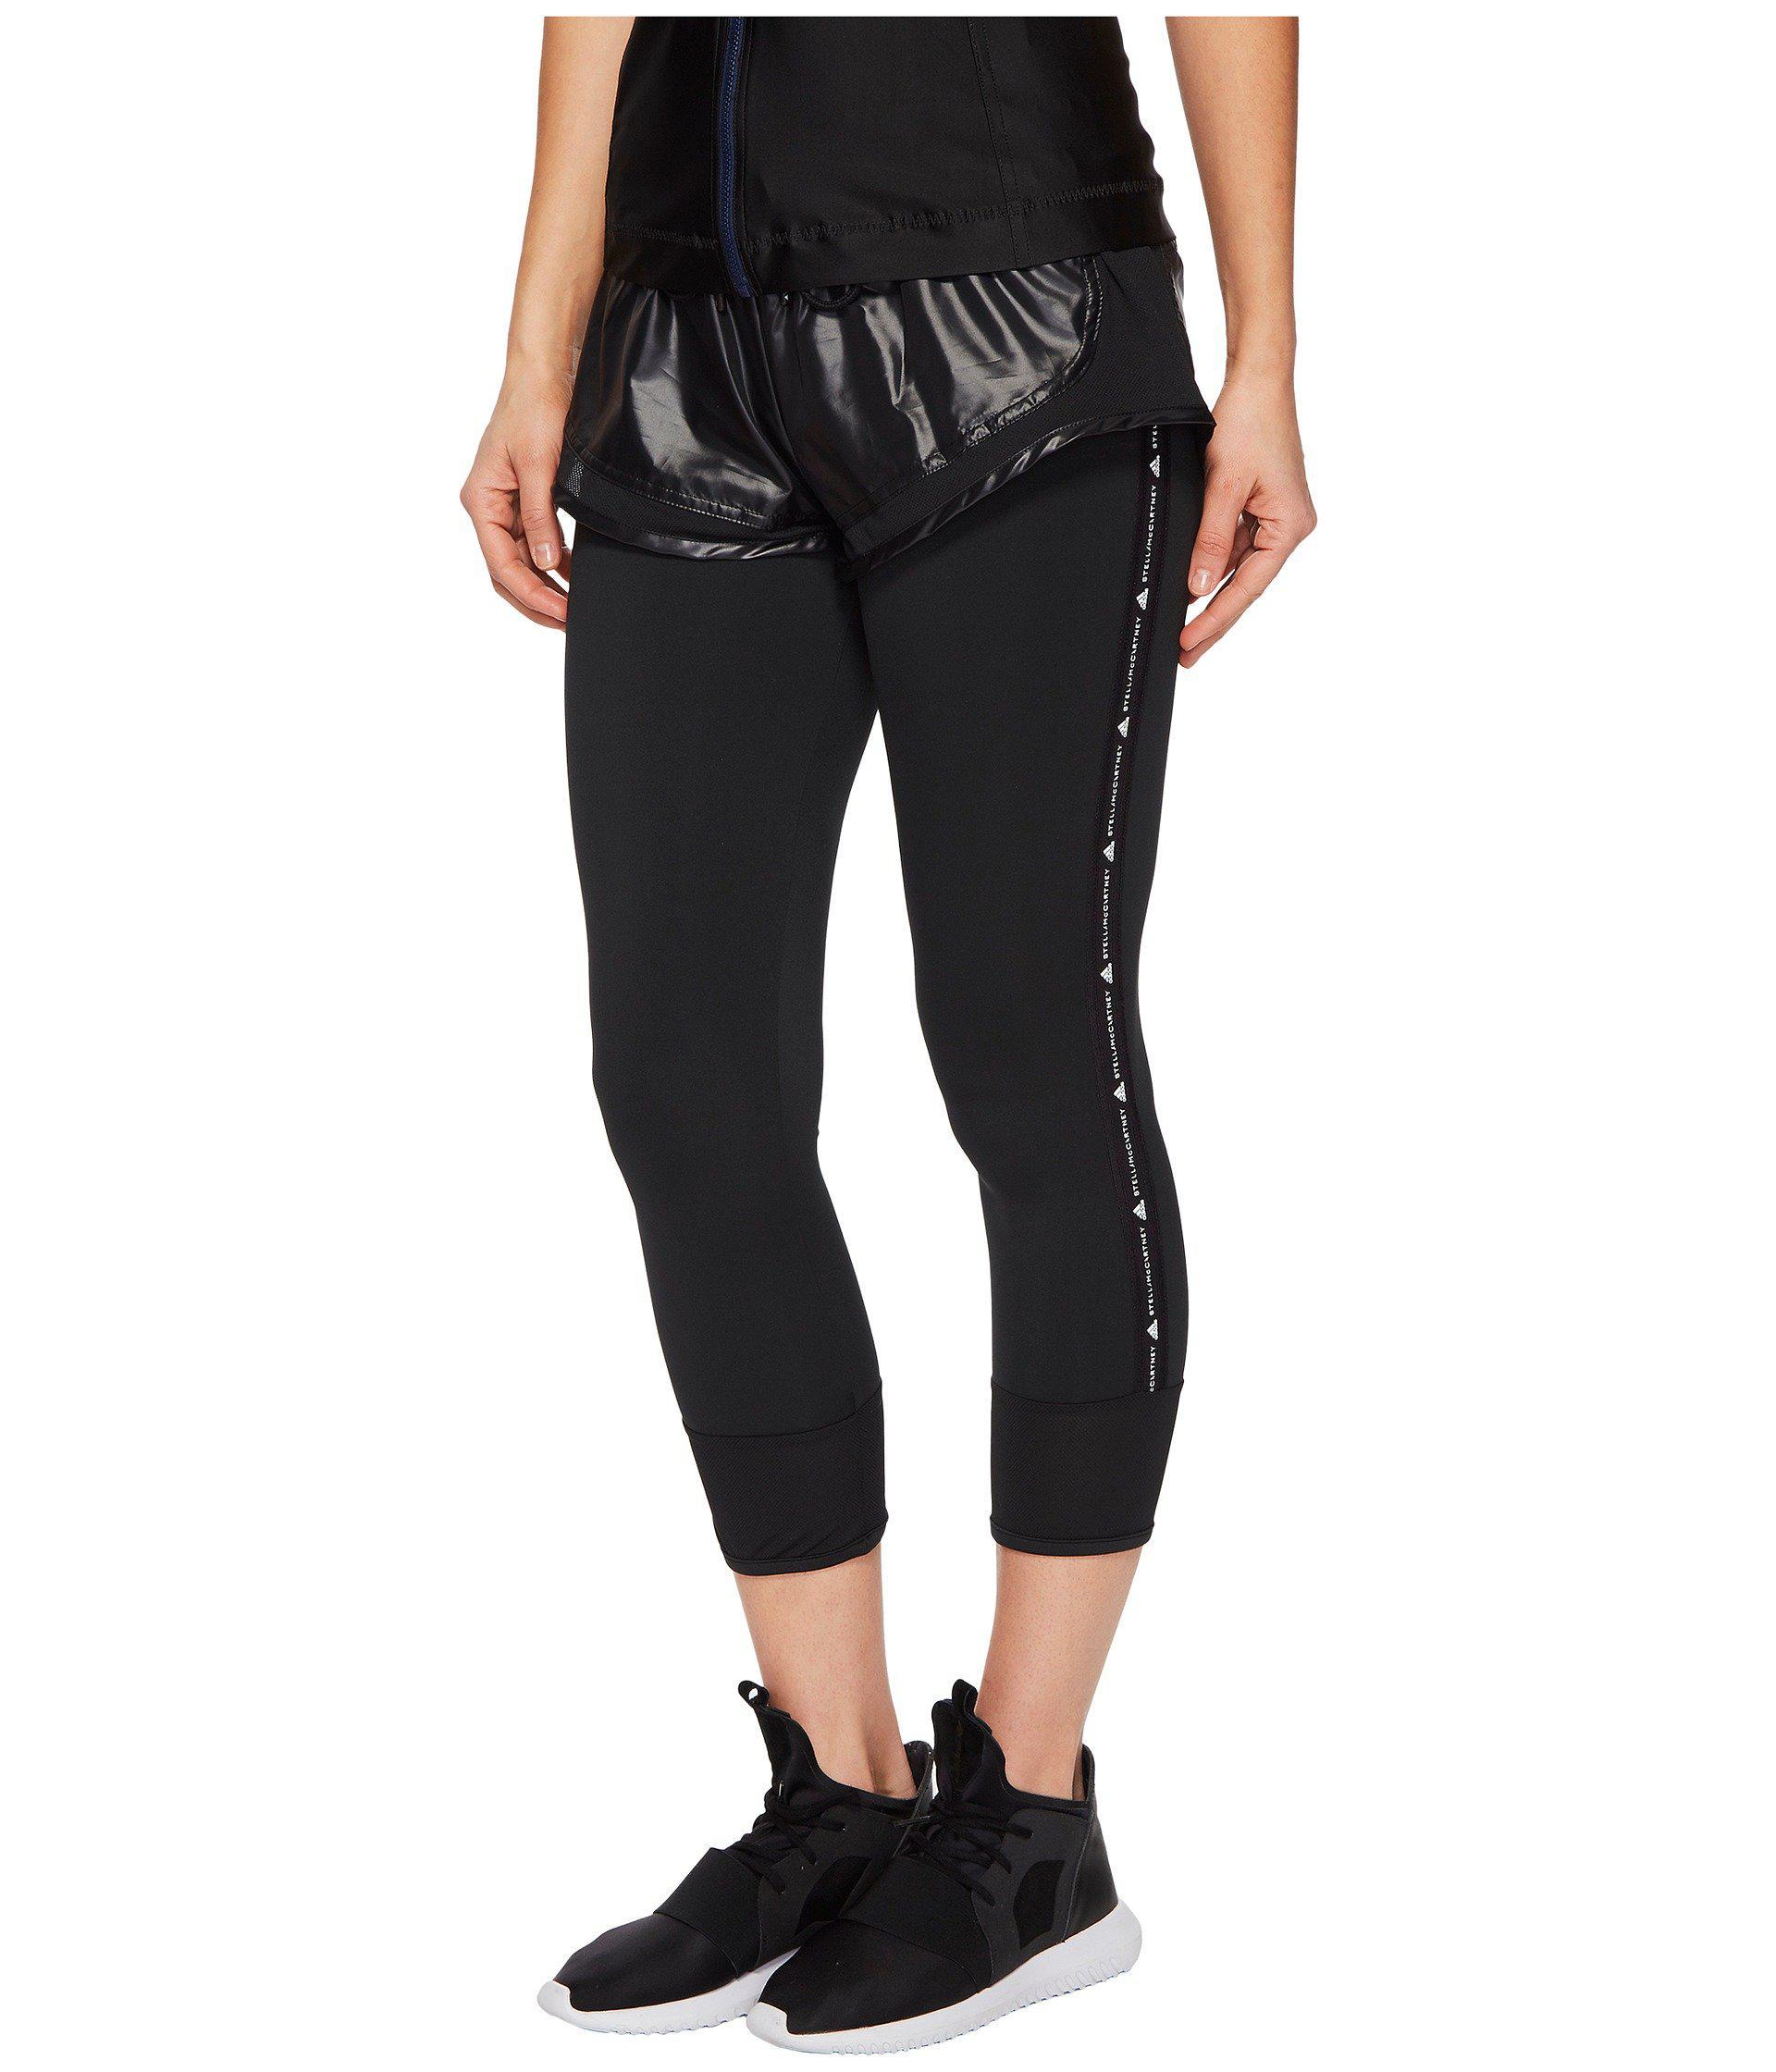 4f04df0242863 Lyst - Adidas By Stella Mccartney Performance Essentials Shorts Over Tights  Cg0899 in Black